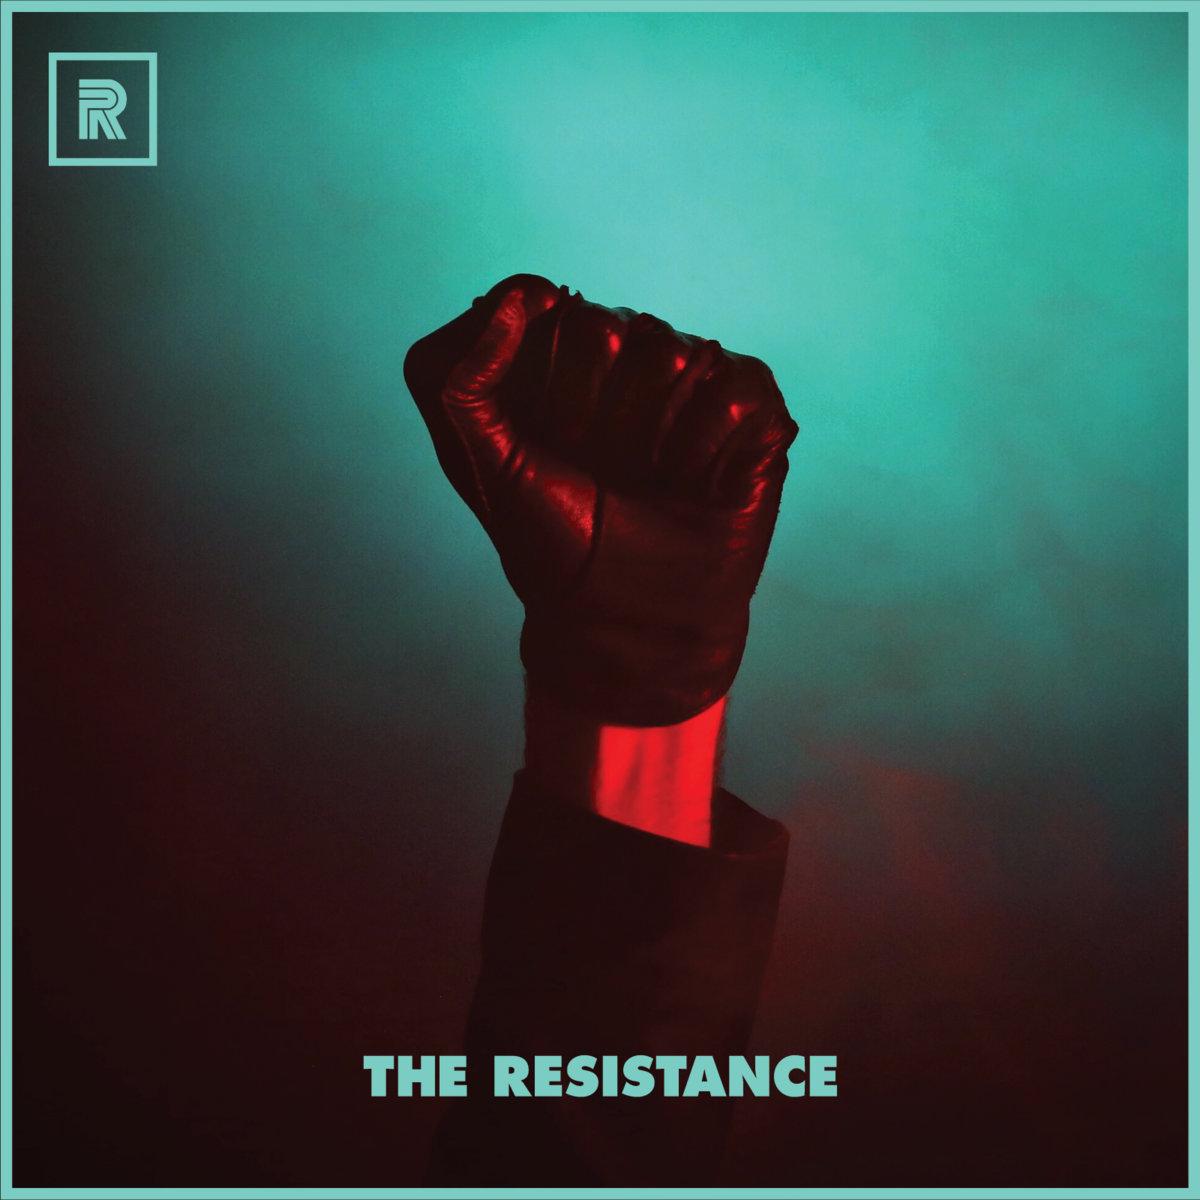 79c86471bda8 The Resistance